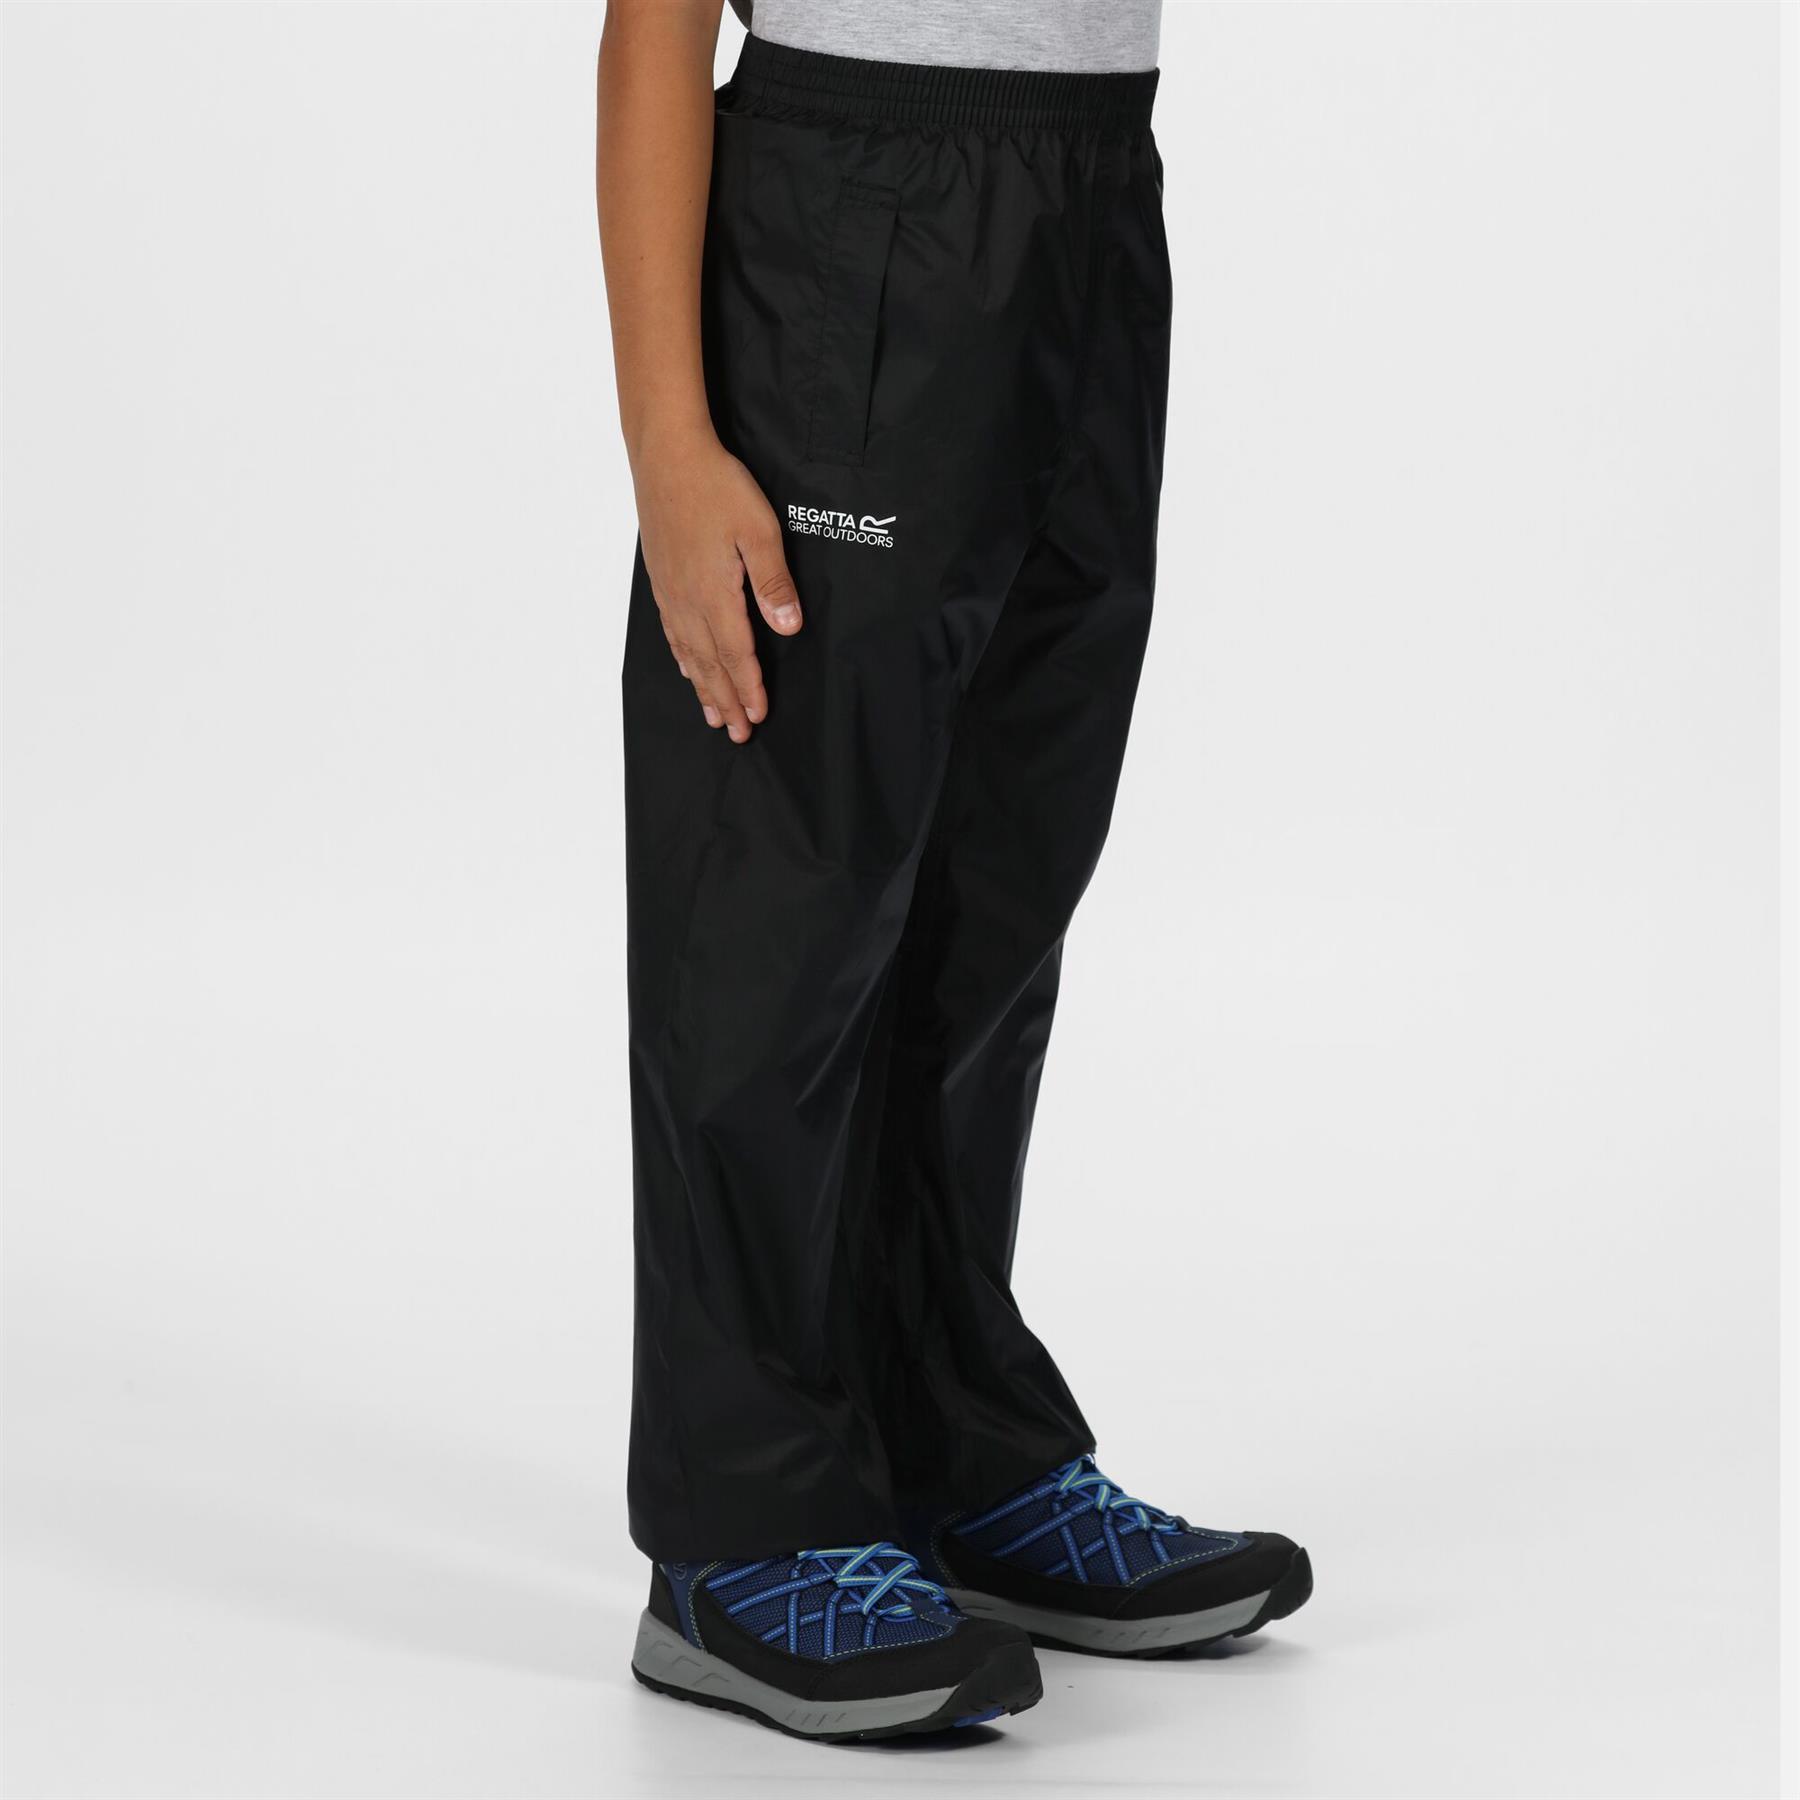 miniatuur 3 - Regatta Kids Pack It Waterproof Packable Overtrousers Boys Girls Trousers